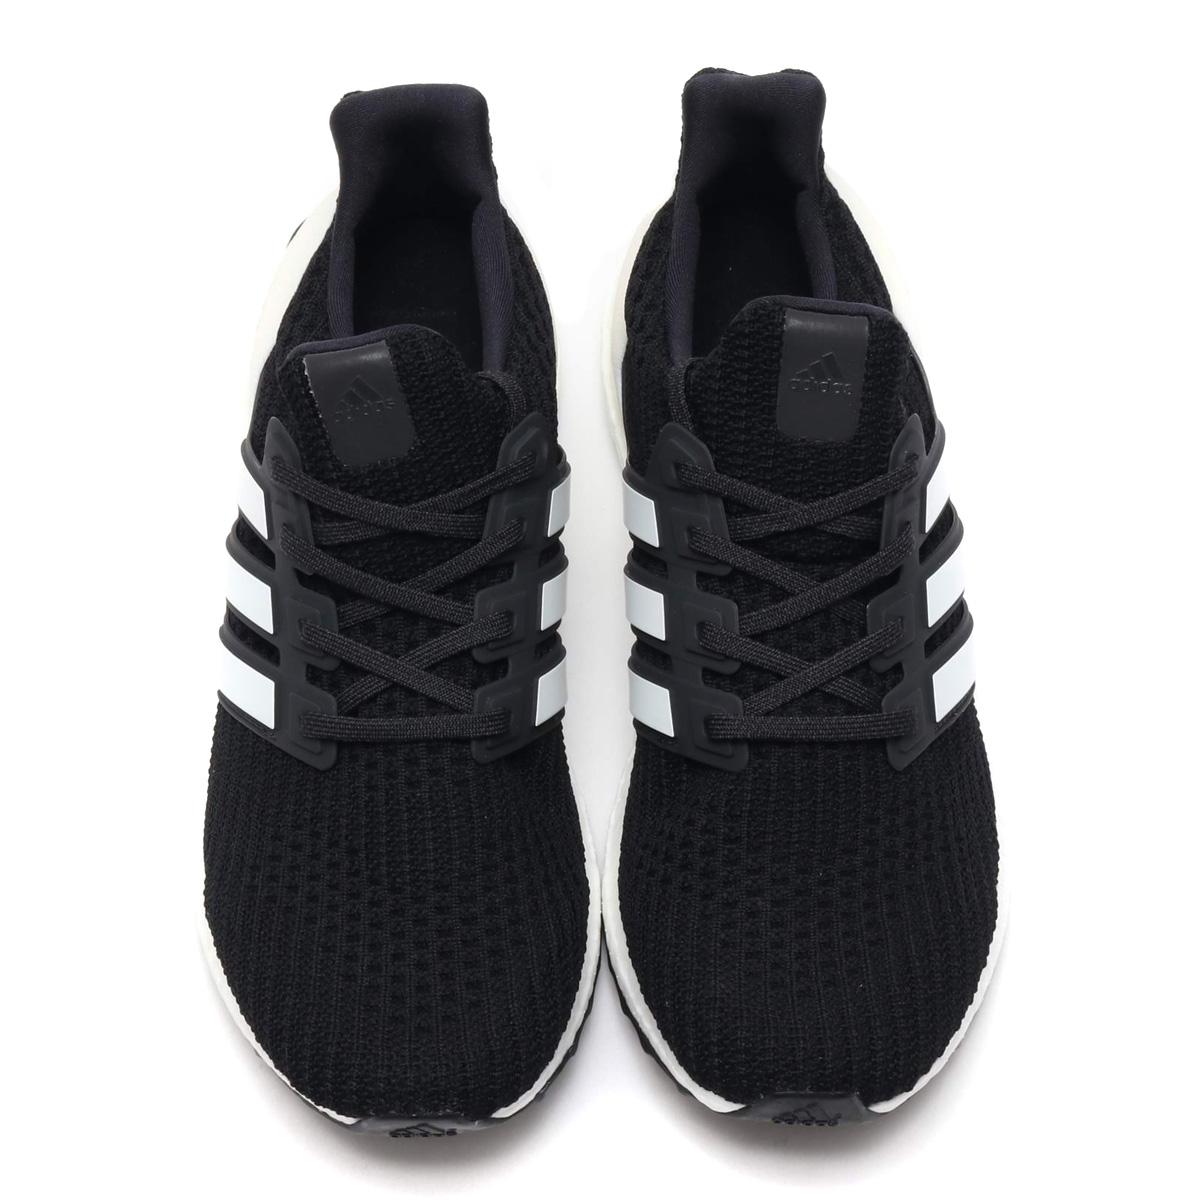 3740f2261f991 adidas UltraBOOST (Adidas ultra boost) core black   cloud white F18  carbon  S18 18FW-I